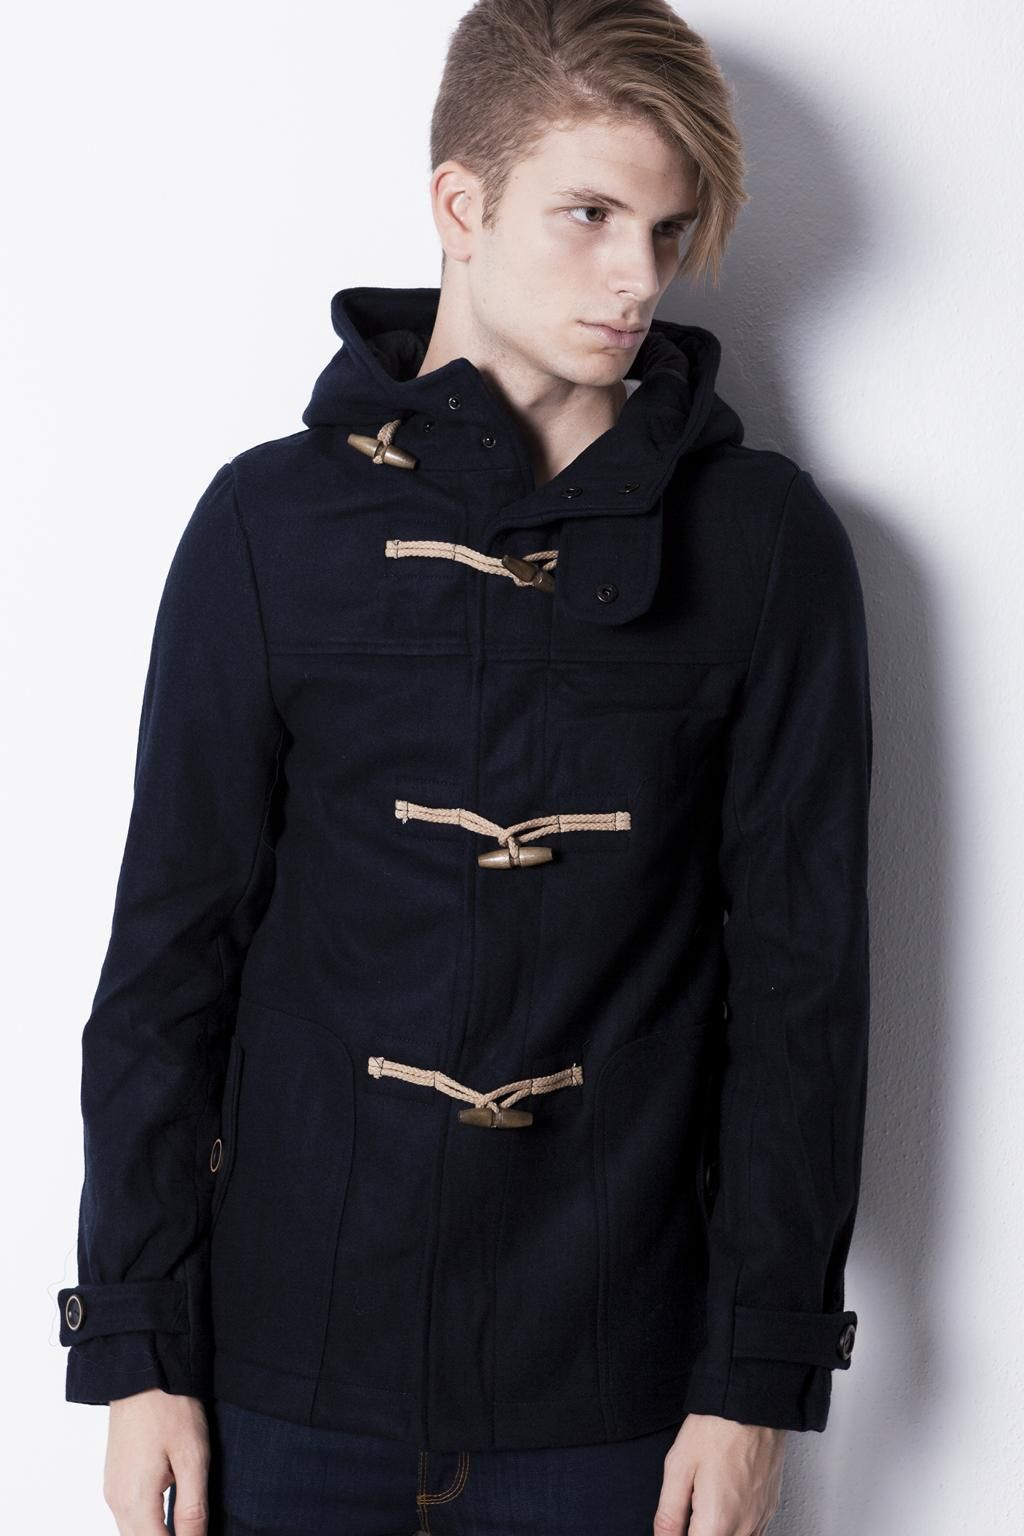 Celopman Ropa Hombre Verproducto Site Athletic Jacket Fashion Puma Jacket [ 1536 x 1024 Pixel ]